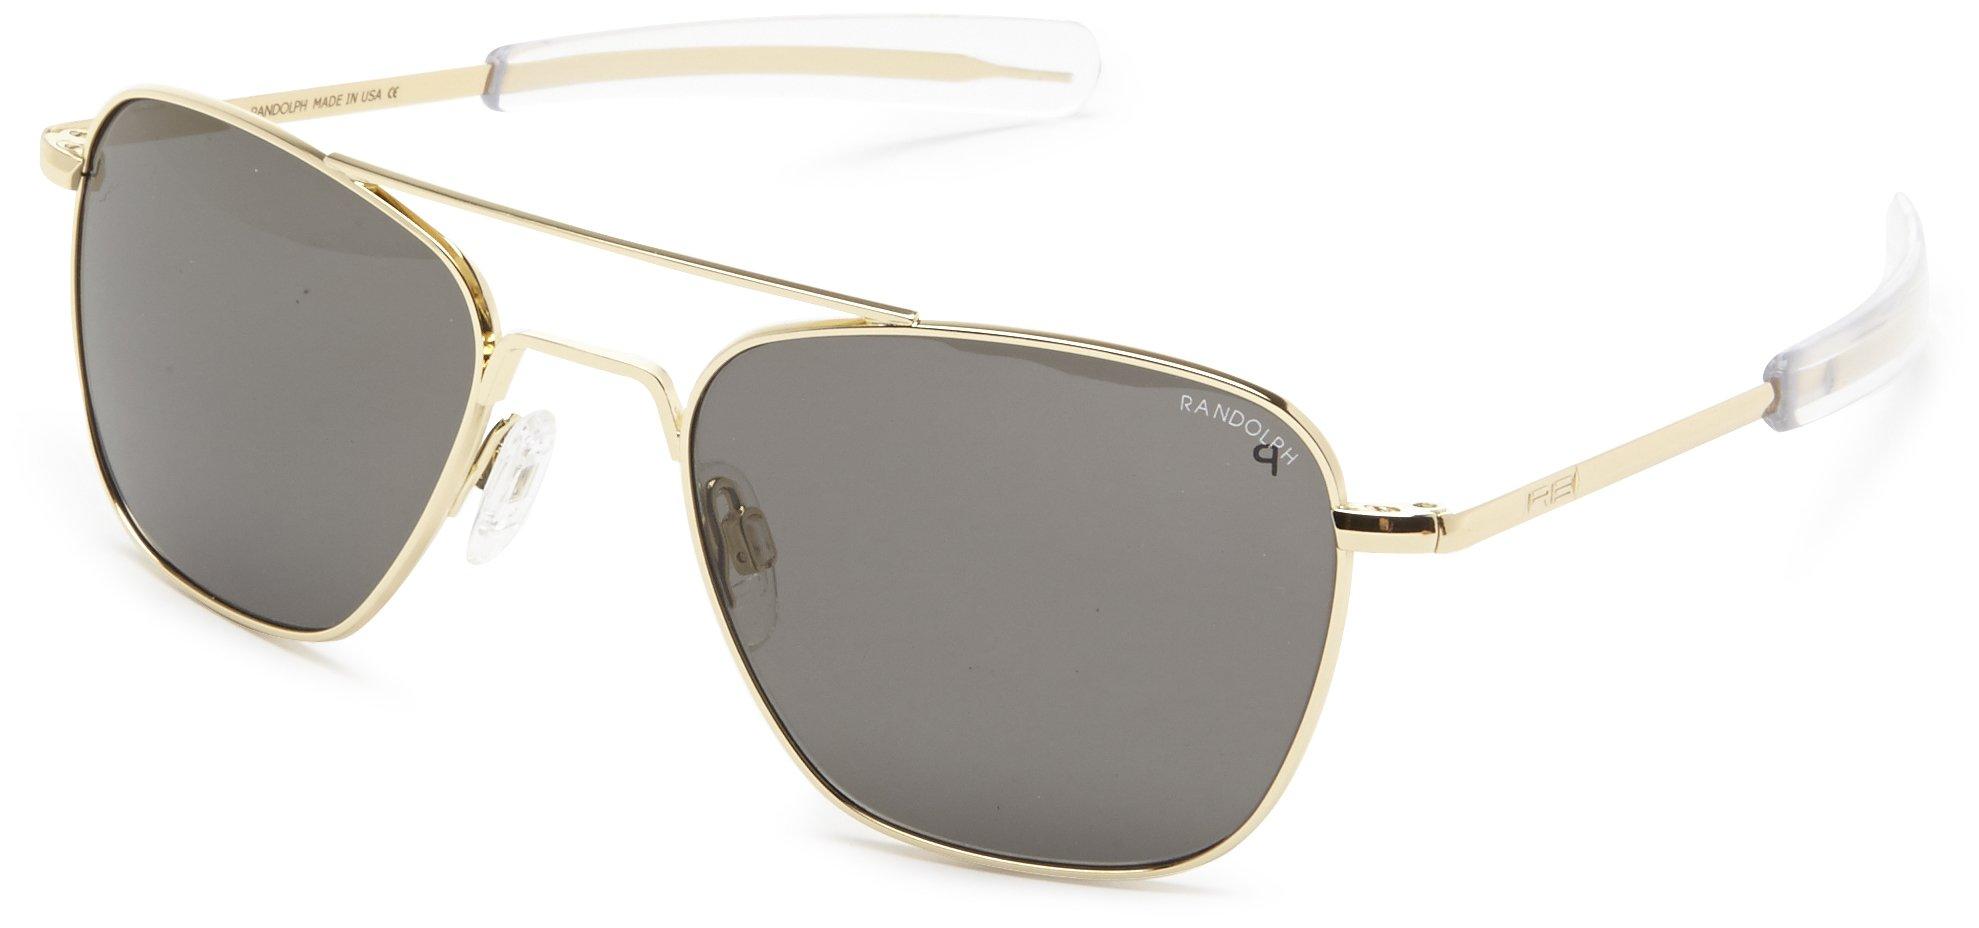 Randolph Aviator Polarized Sunglasses,23K Gold Plated/Grey 52 mm